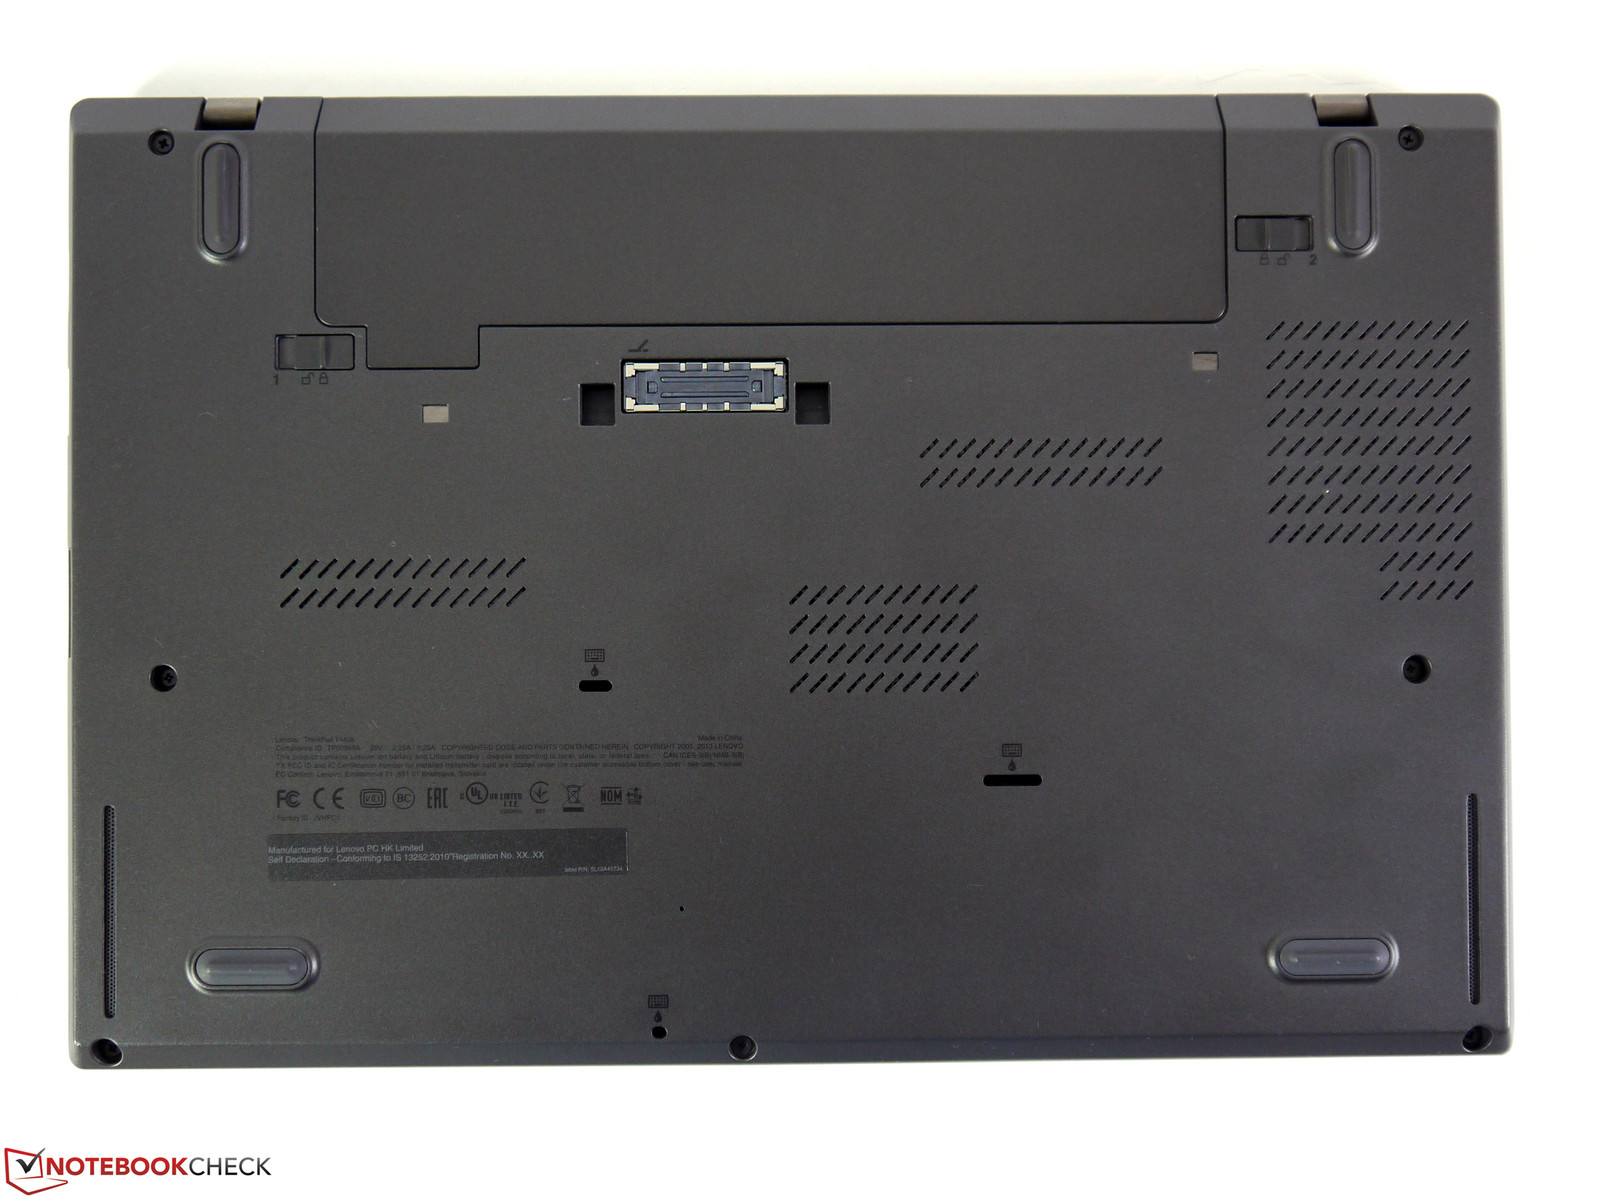 Test update lenovo thinkpad t440s 20aq006bge ultrabook